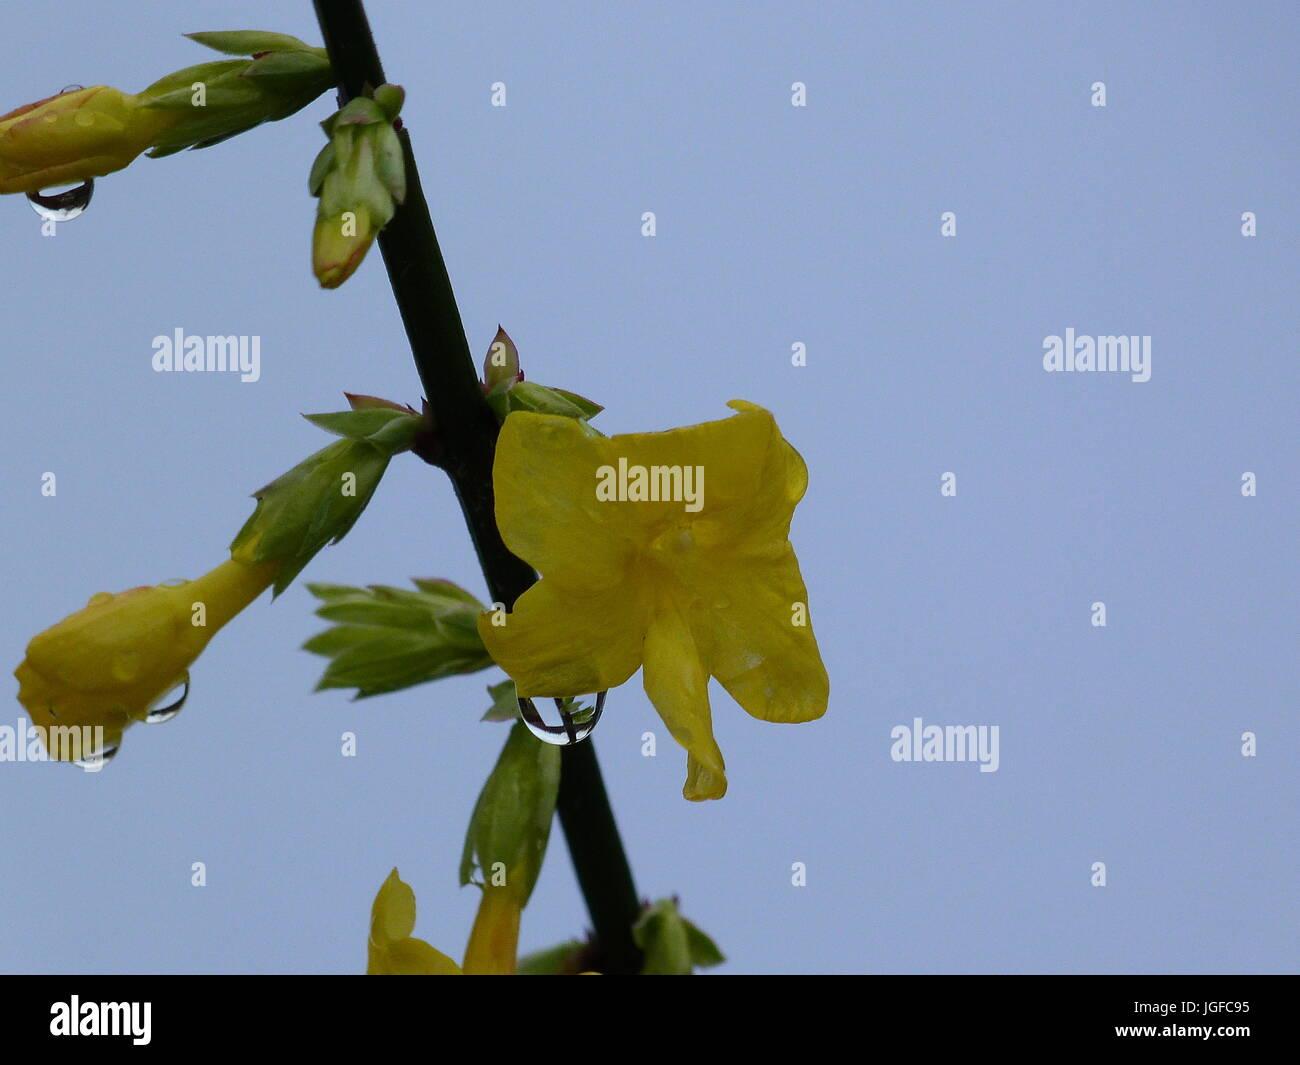 Yellow jasmine flowers stock photo 147856385 alamy yellow jasmine flowers izmirmasajfo Images